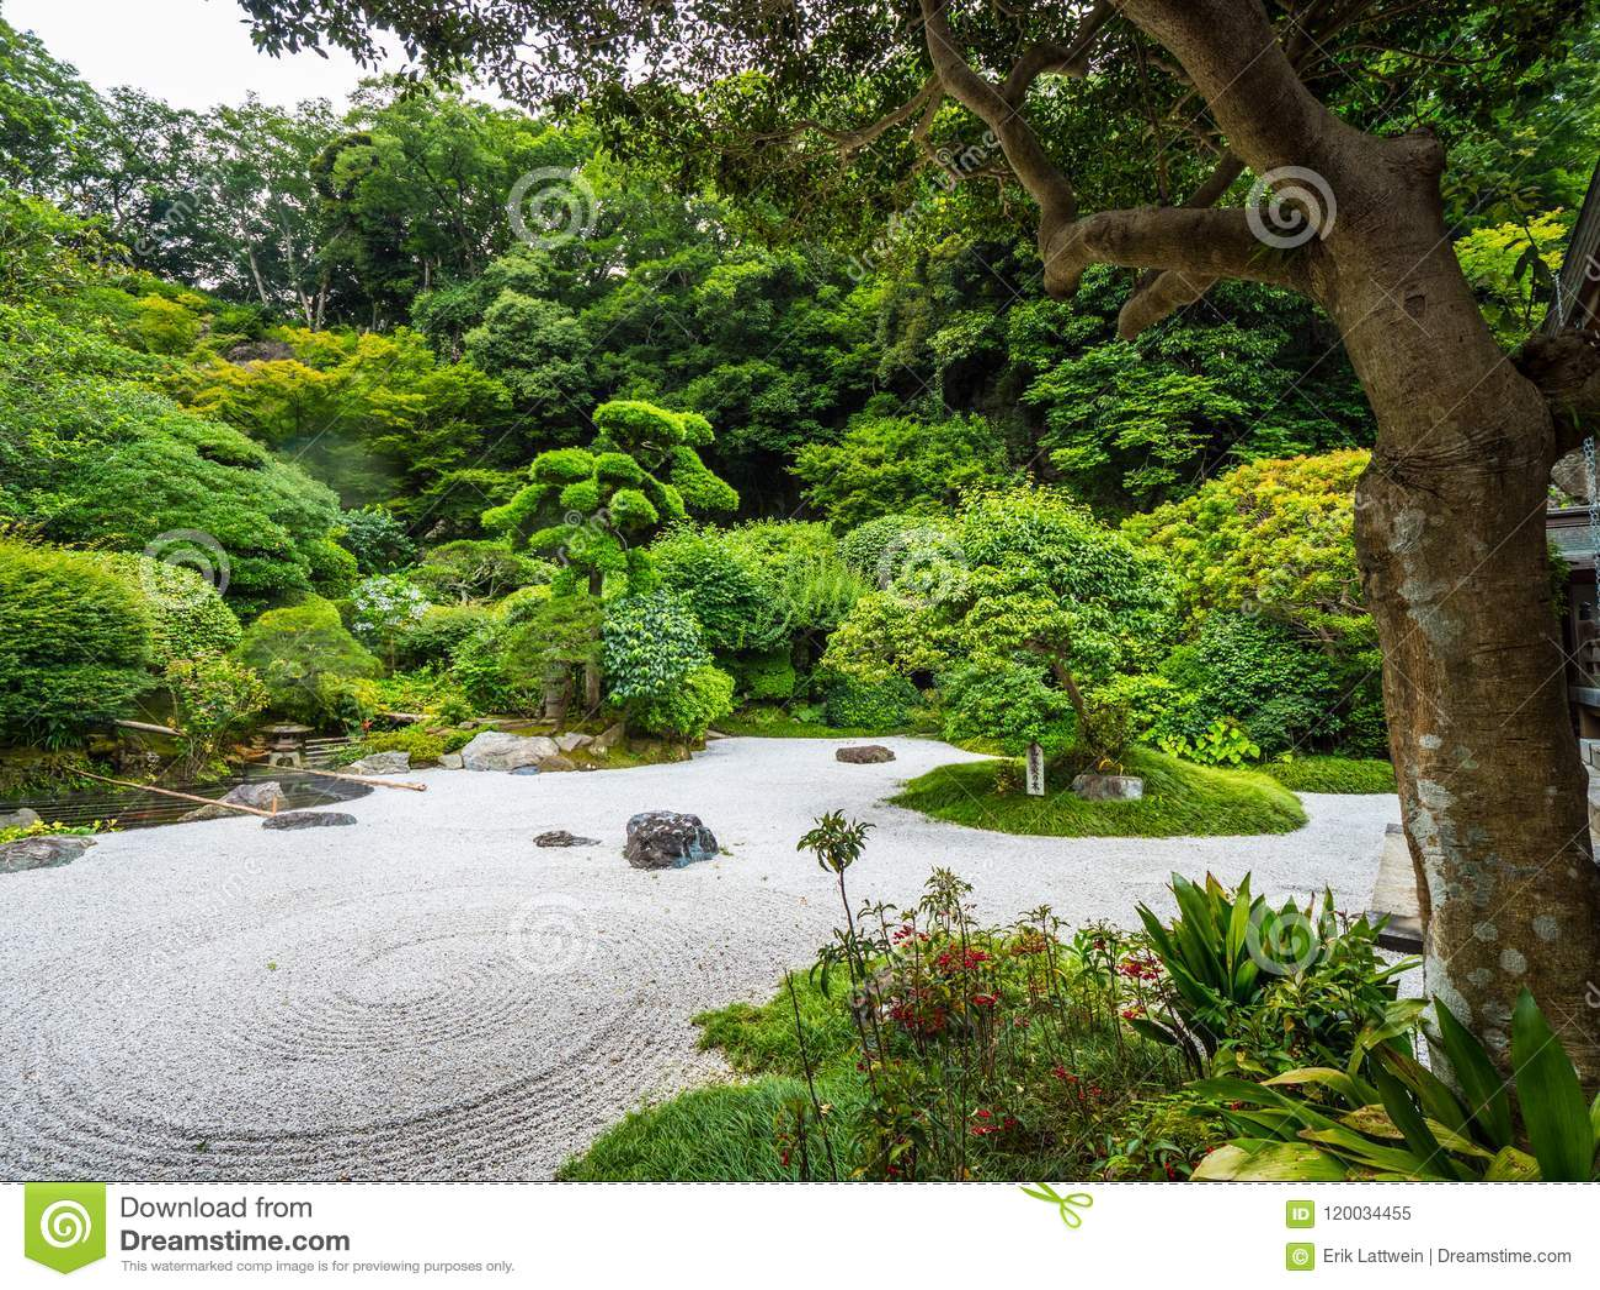 Beau Petit Jardin Japonais à Kamakura - à TOKYO, JAPON - 17 Juin ...